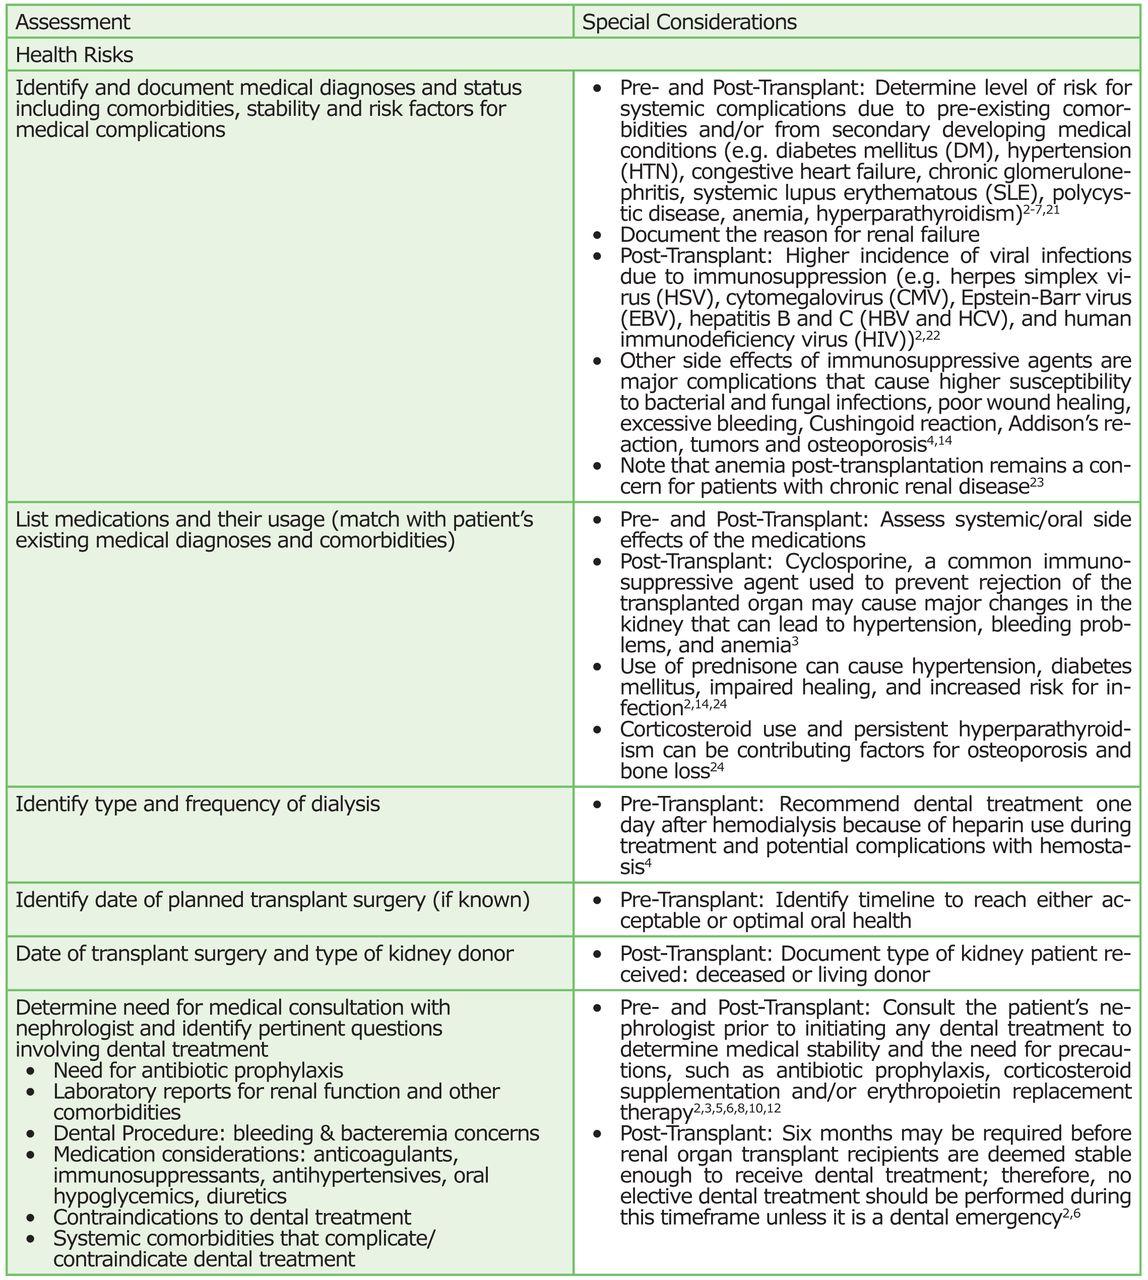 A Comprehensive Oral Preventive Care Protocol for Caring for